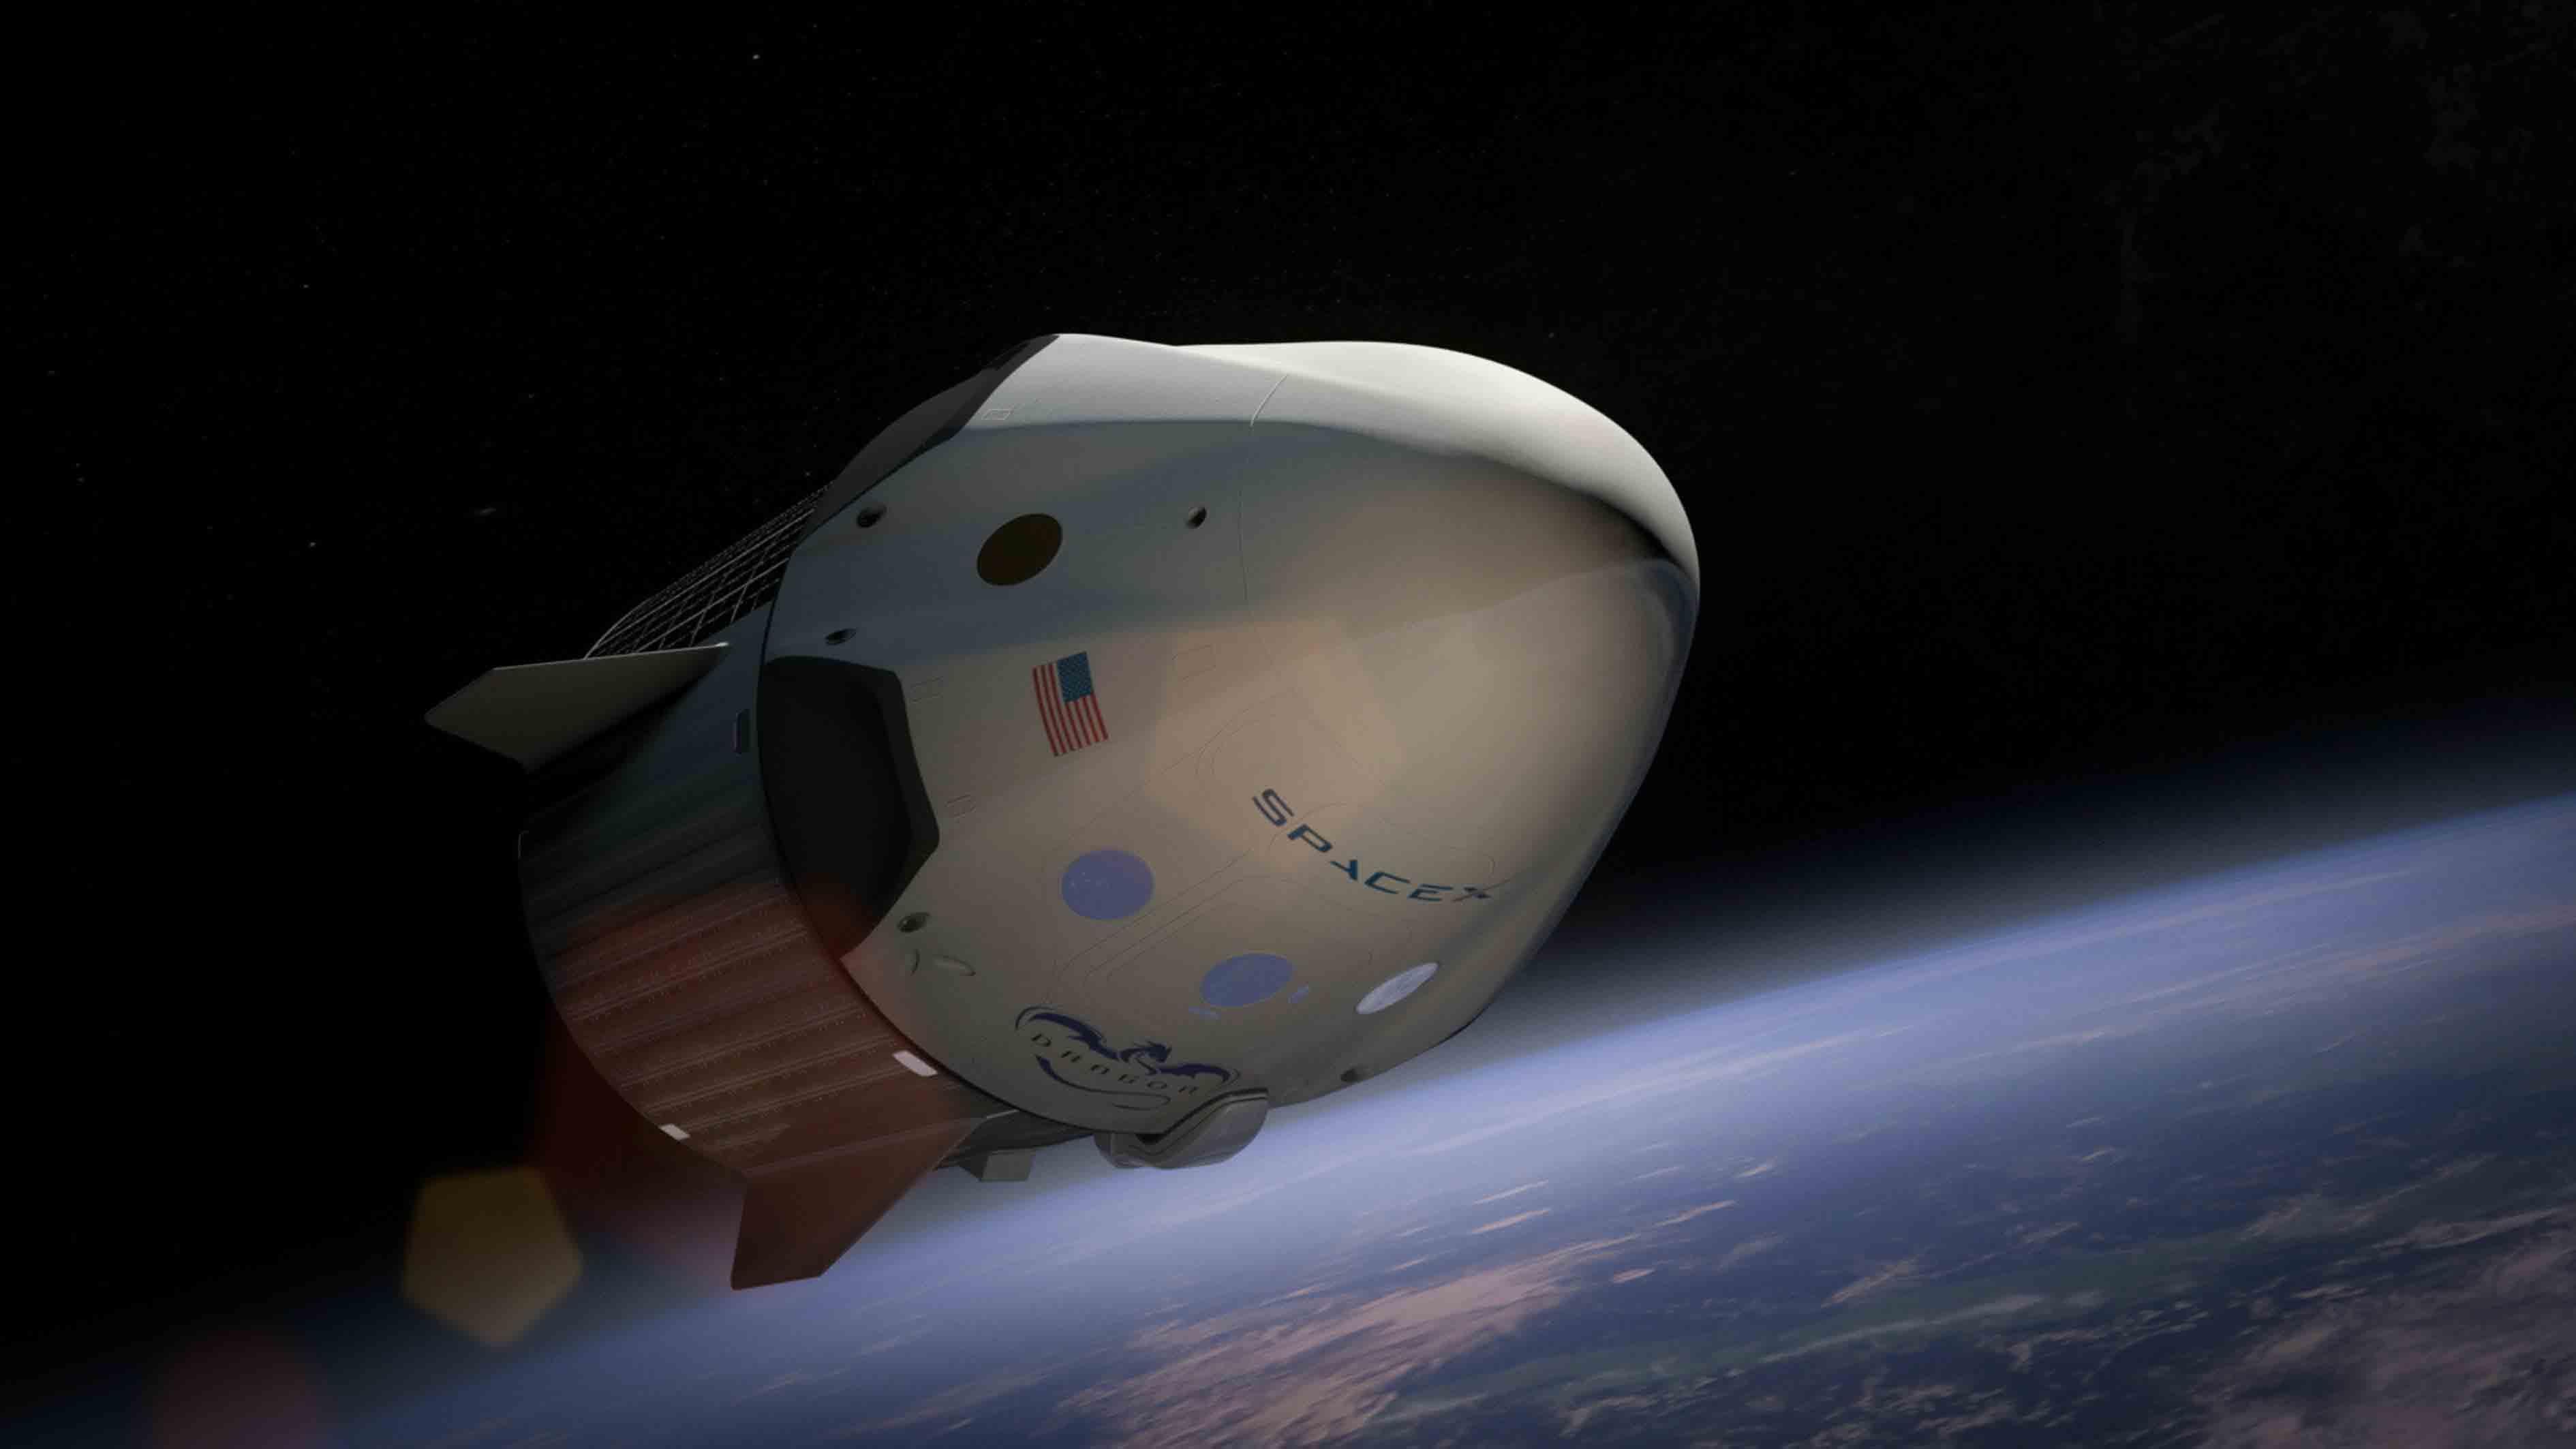 Sonda SpaceX